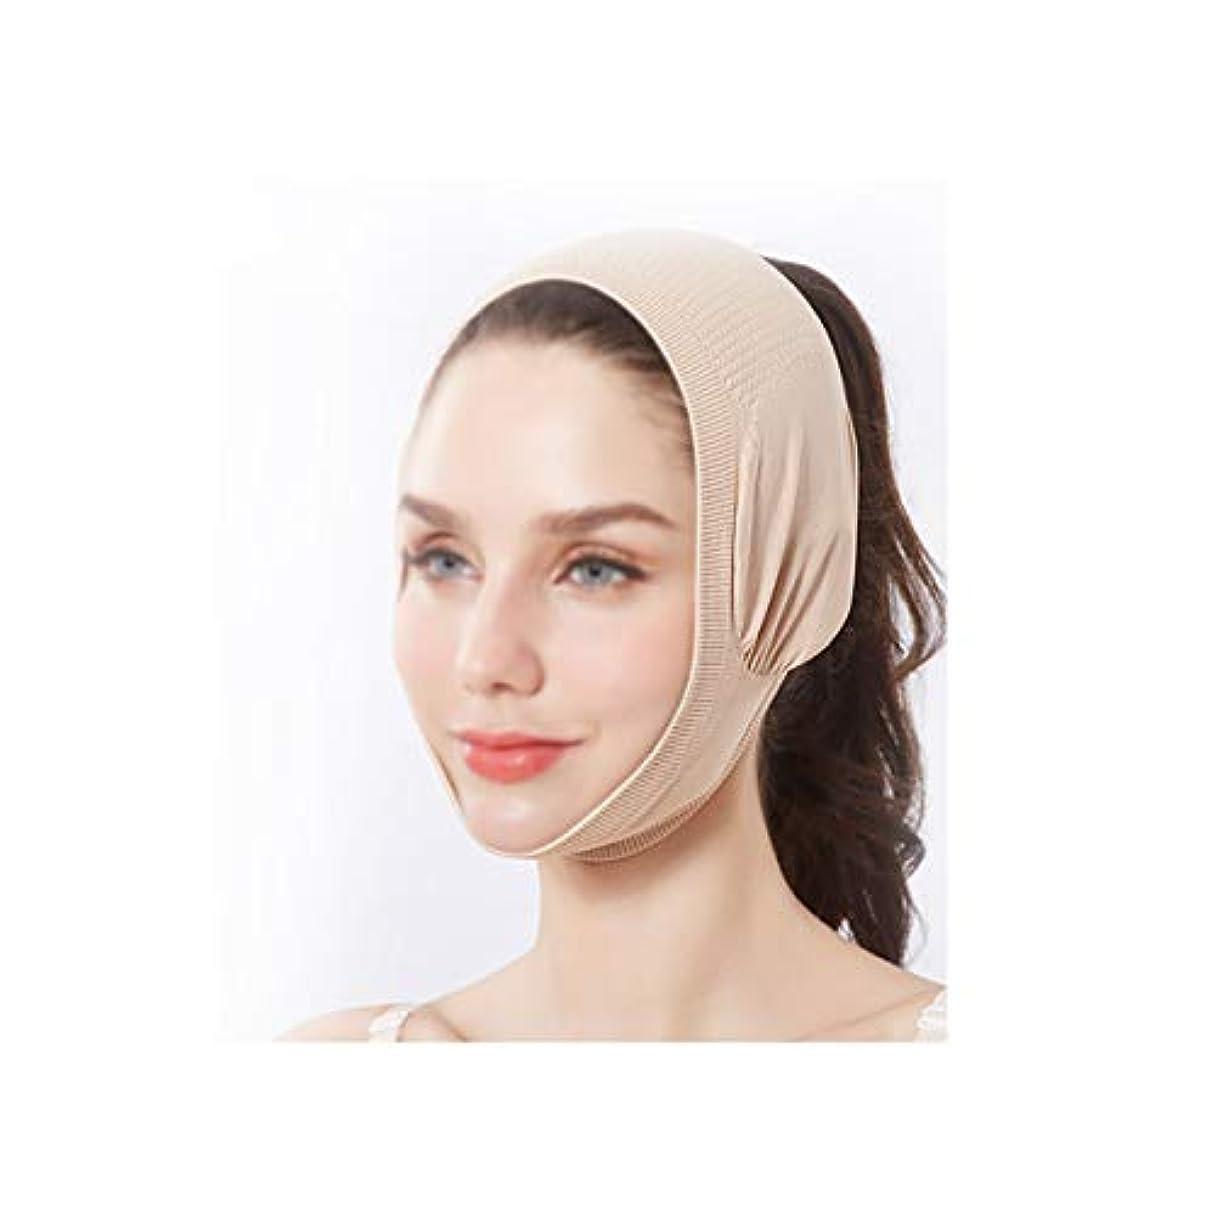 TLMY フェイスリフトマスクマスクエクステンション強度フェースレス包帯フェイシャルラージVライン彫刻フェイシャルバックカバーネックバンド 顔用整形マスク (Color : Skin tone)